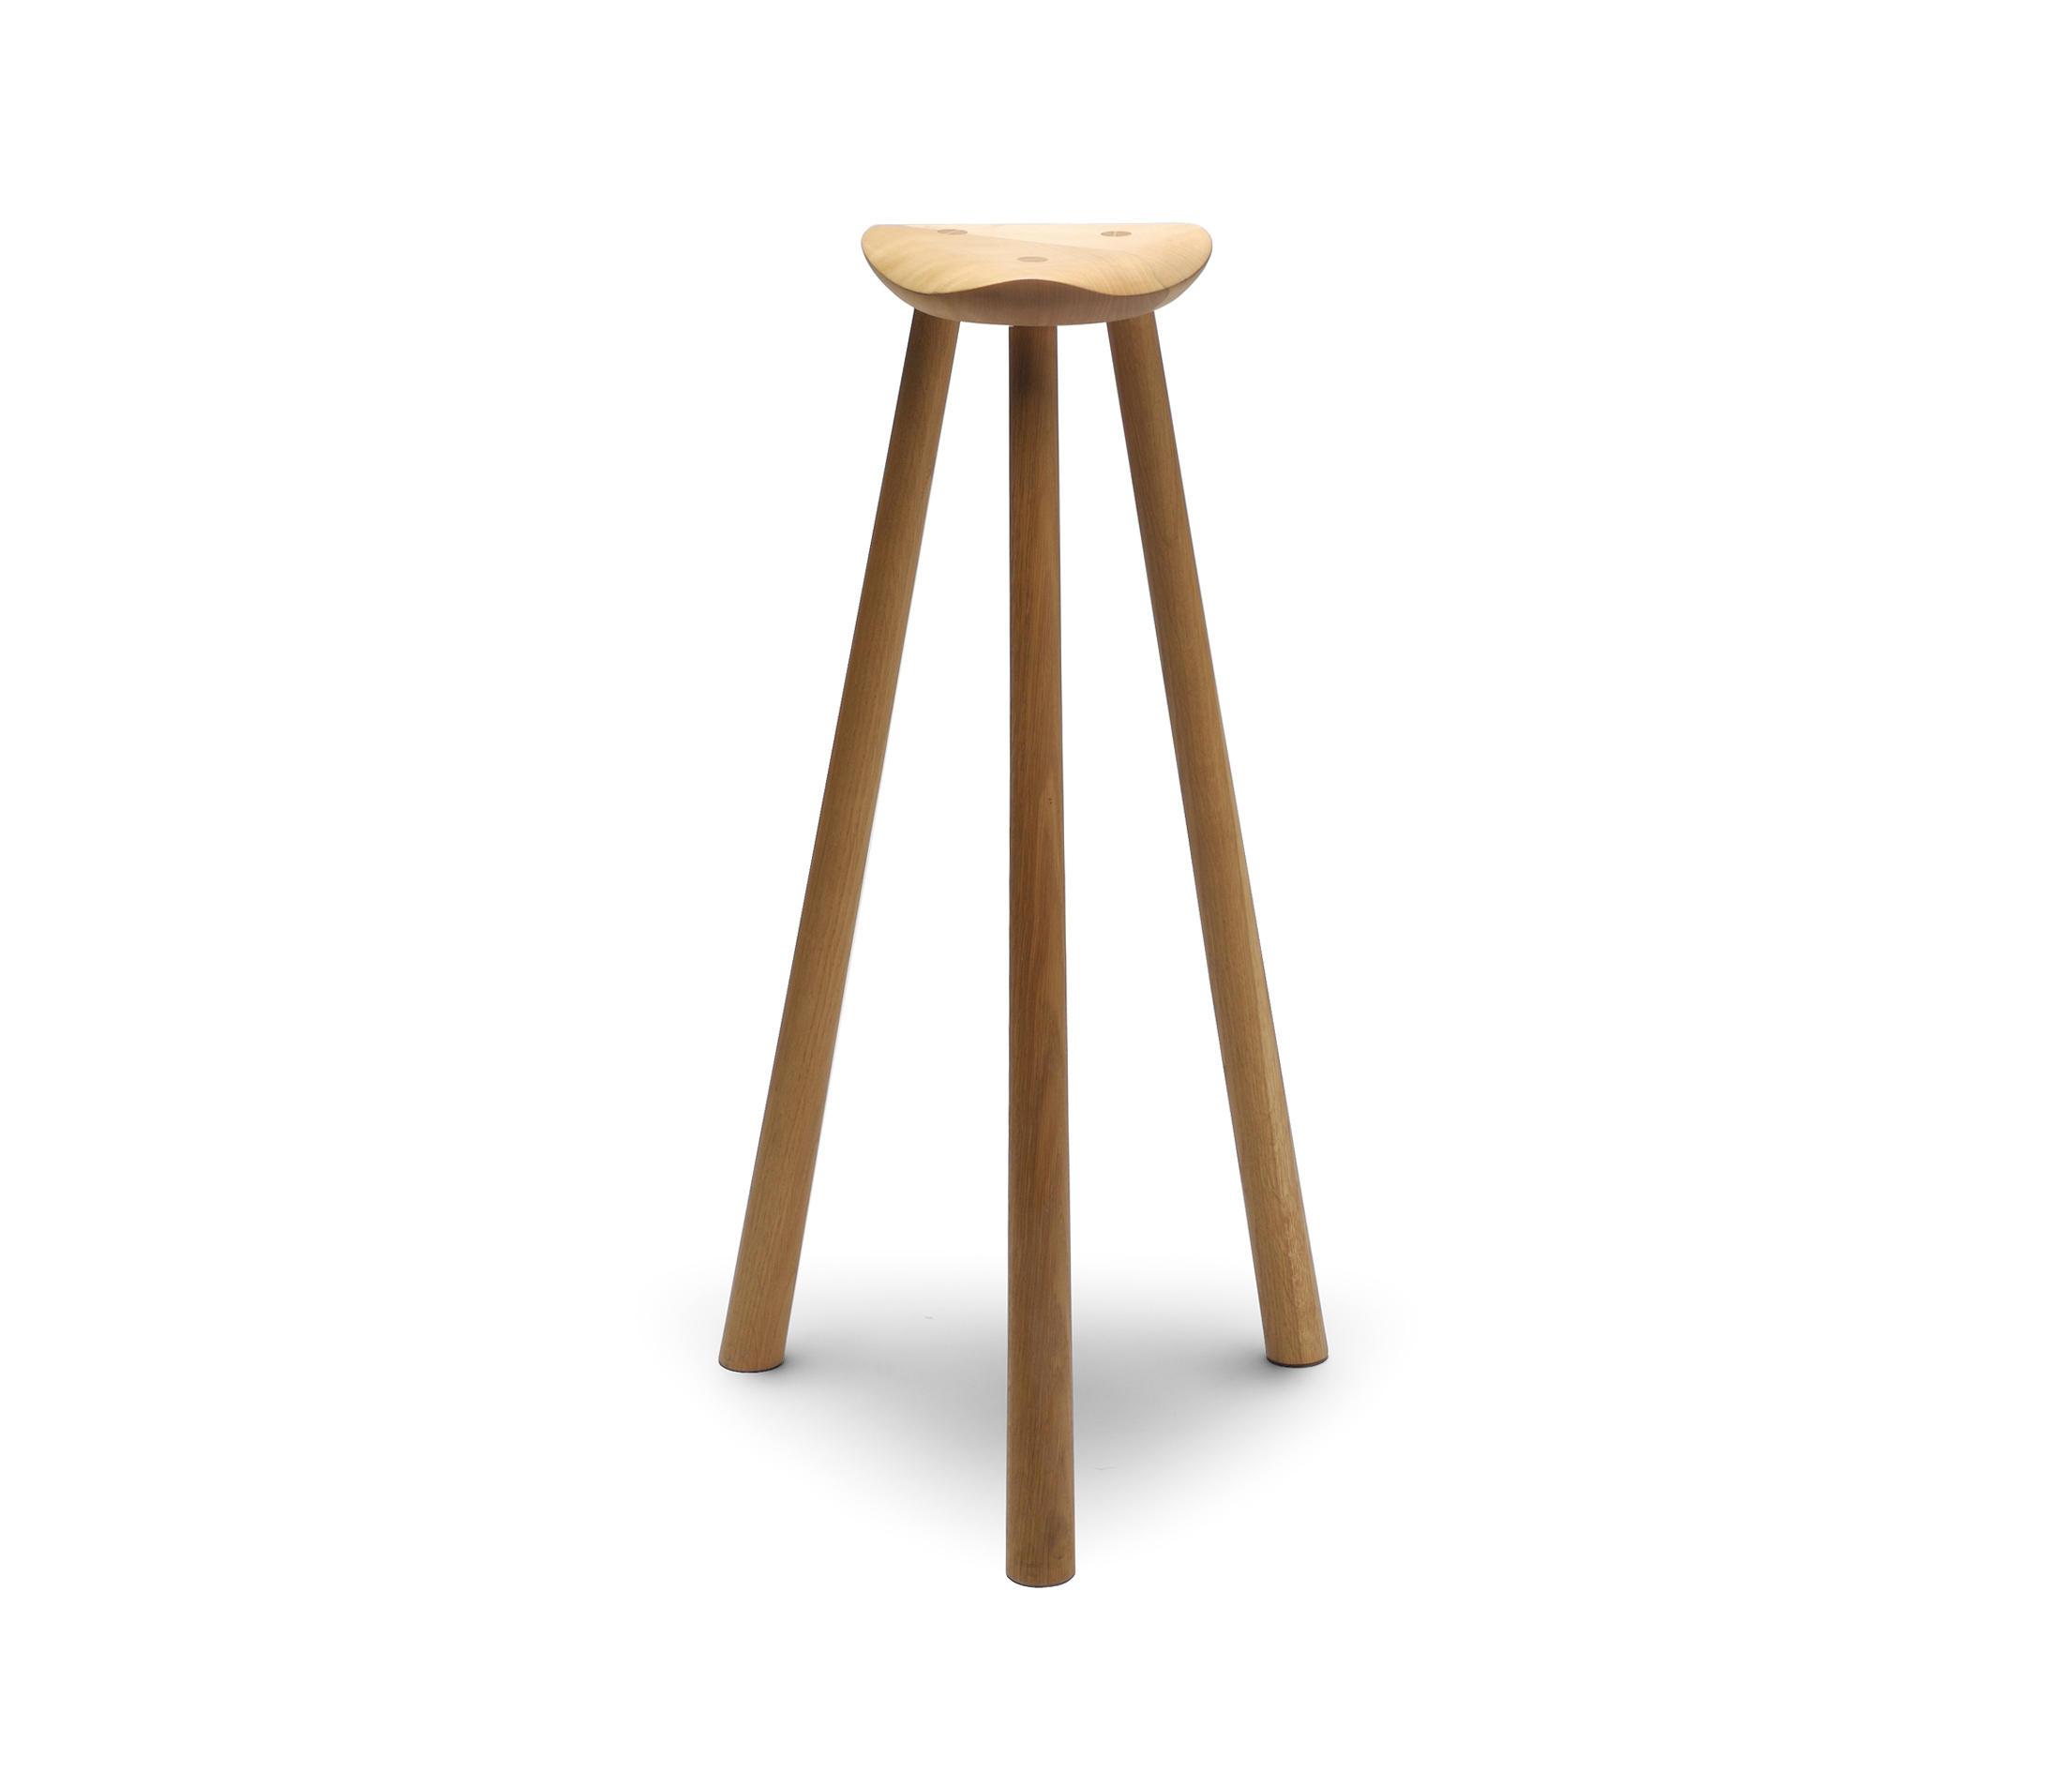 Tremendous Cafe Classic Rmj1 2 3 Stool Architonic Creativecarmelina Interior Chair Design Creativecarmelinacom